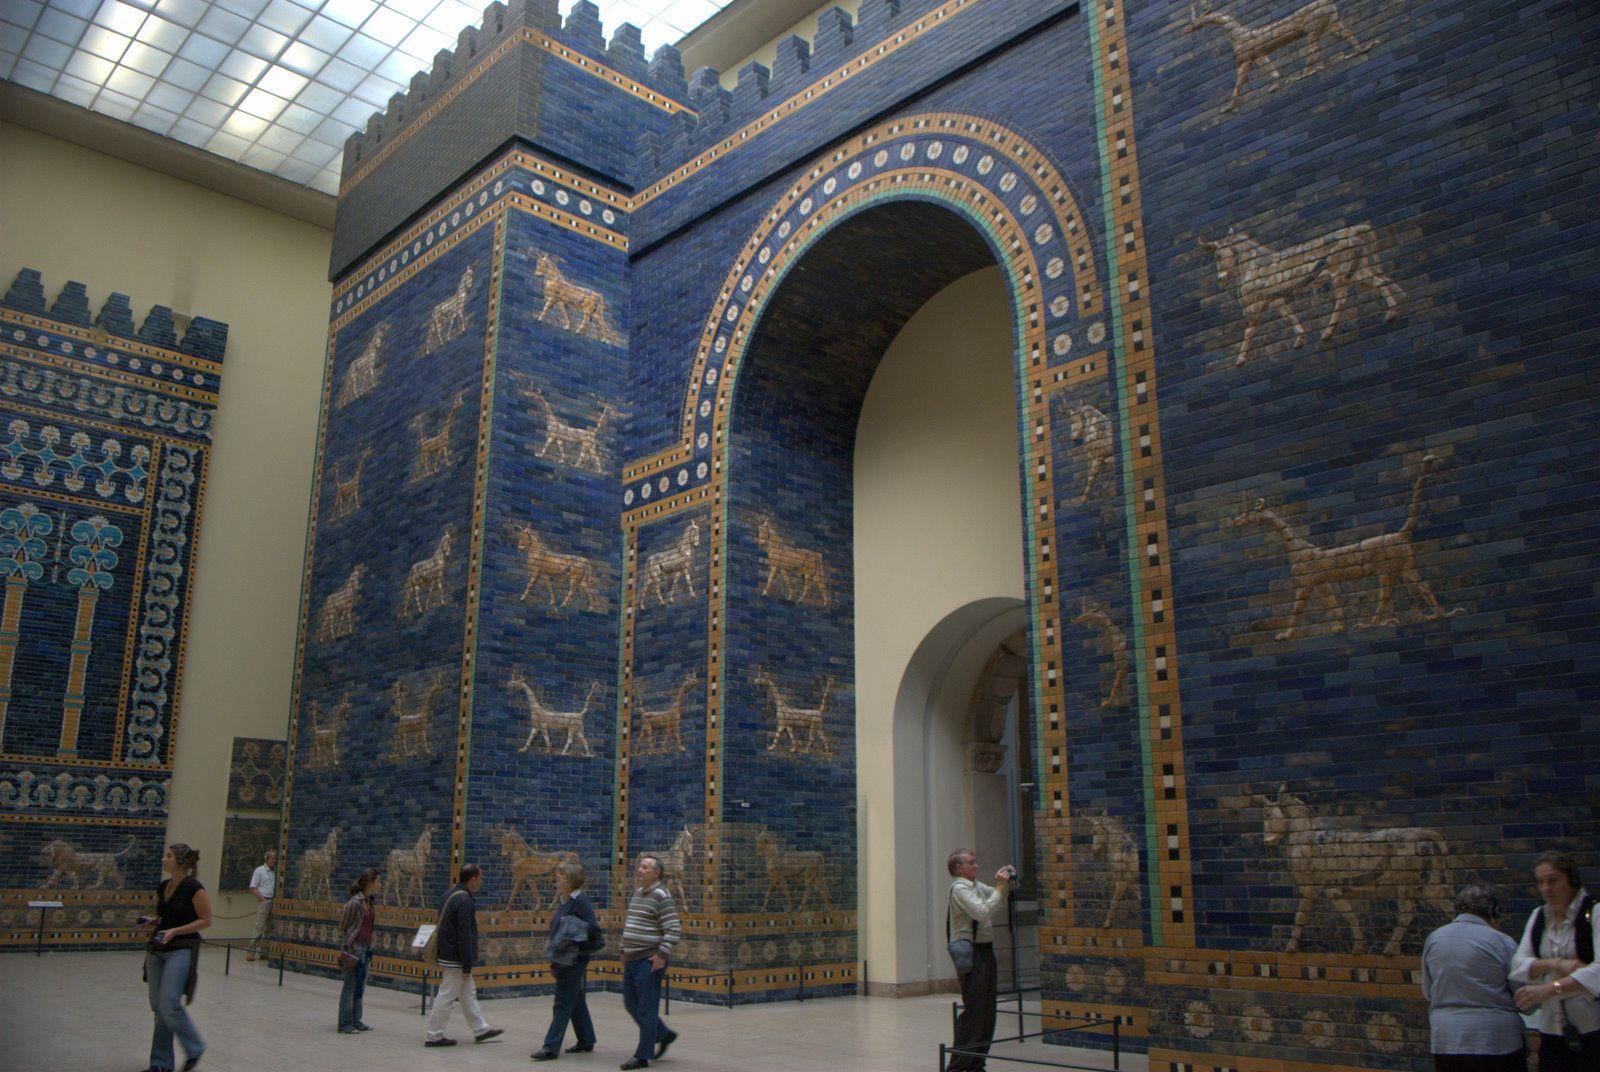 Ishtar Temple Gate Wallpaper Google Search Pergamon Museum Pergamon Pergamon Museum Berlin